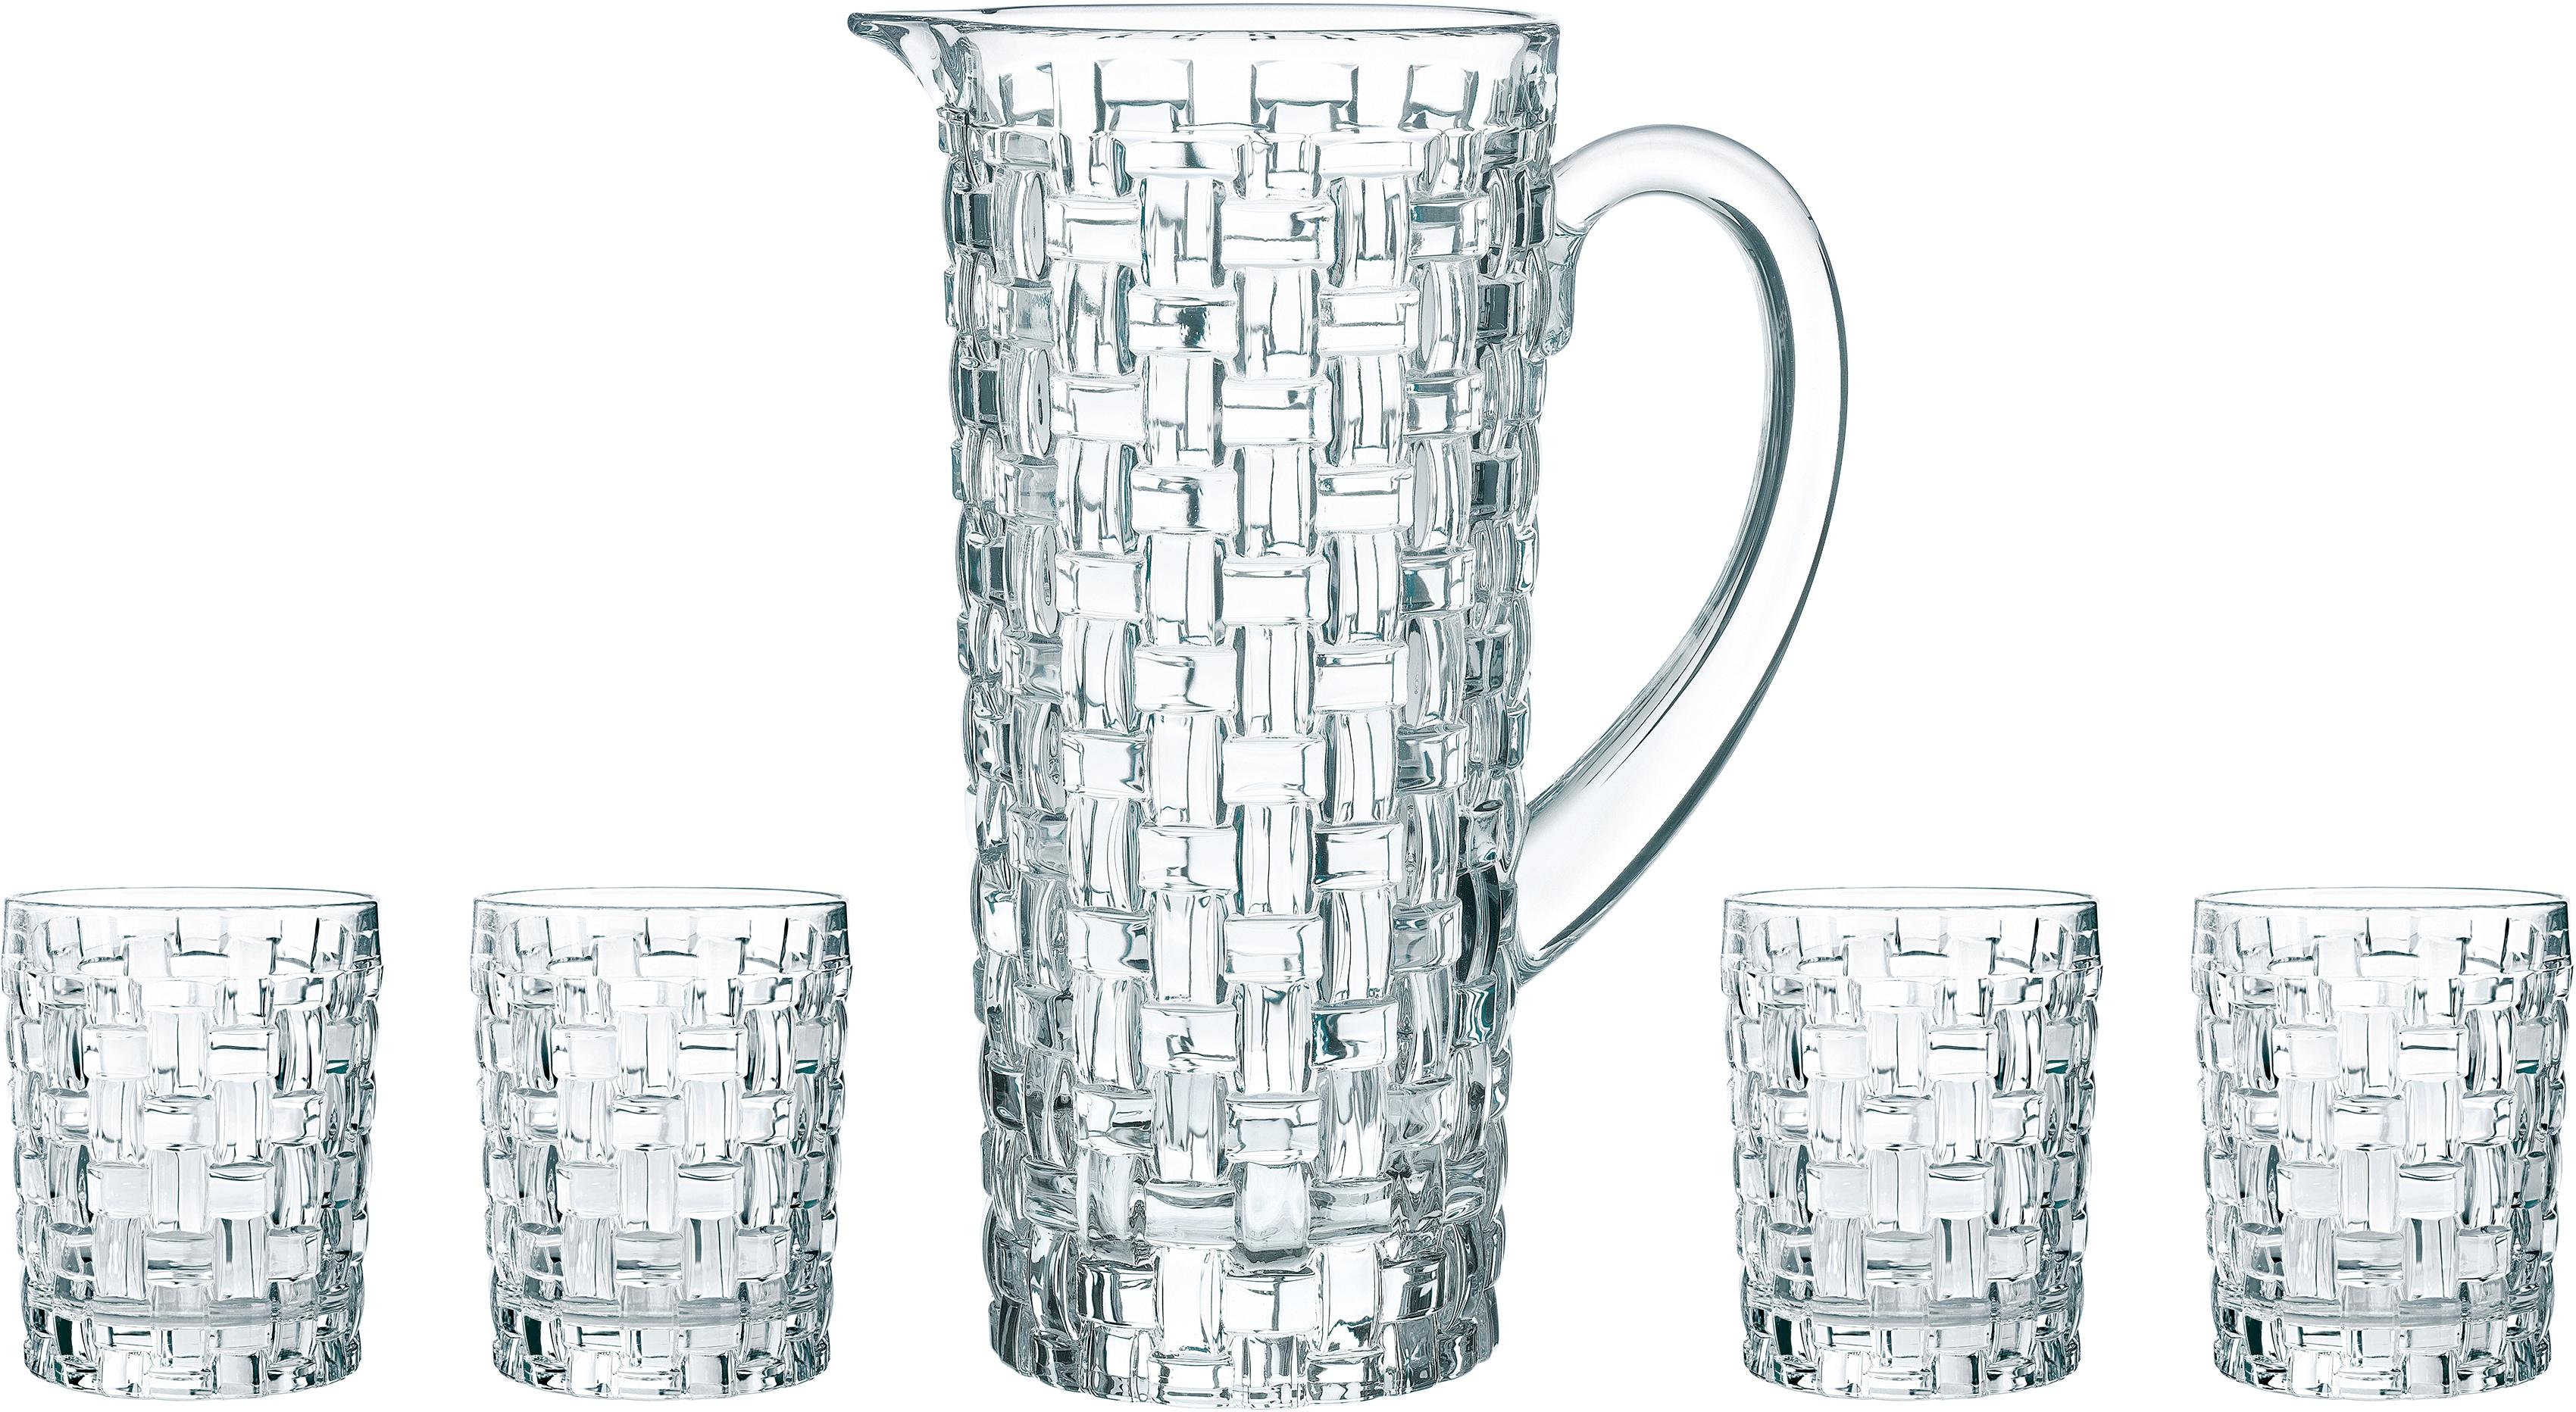 Nachtmann Gläser-Set Bossa Nova, (Set, 5 tlg.), Kristallglas farblos Kristallgläser Gläser Glaswaren Haushaltswaren